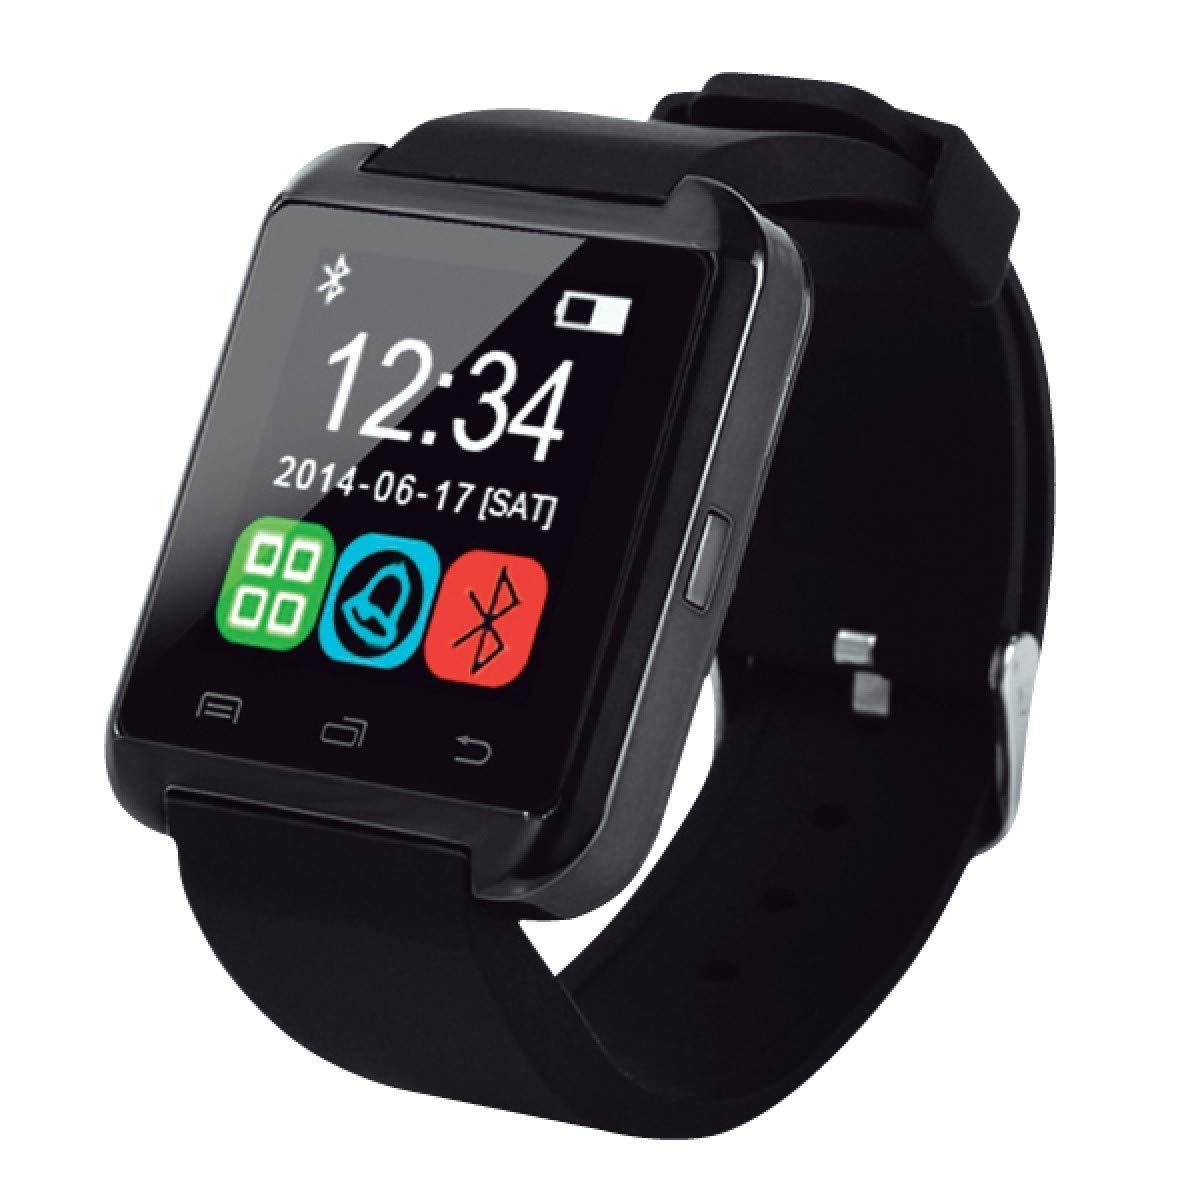 Best Generic U8 Smartwatch Under 1000 Rs in India